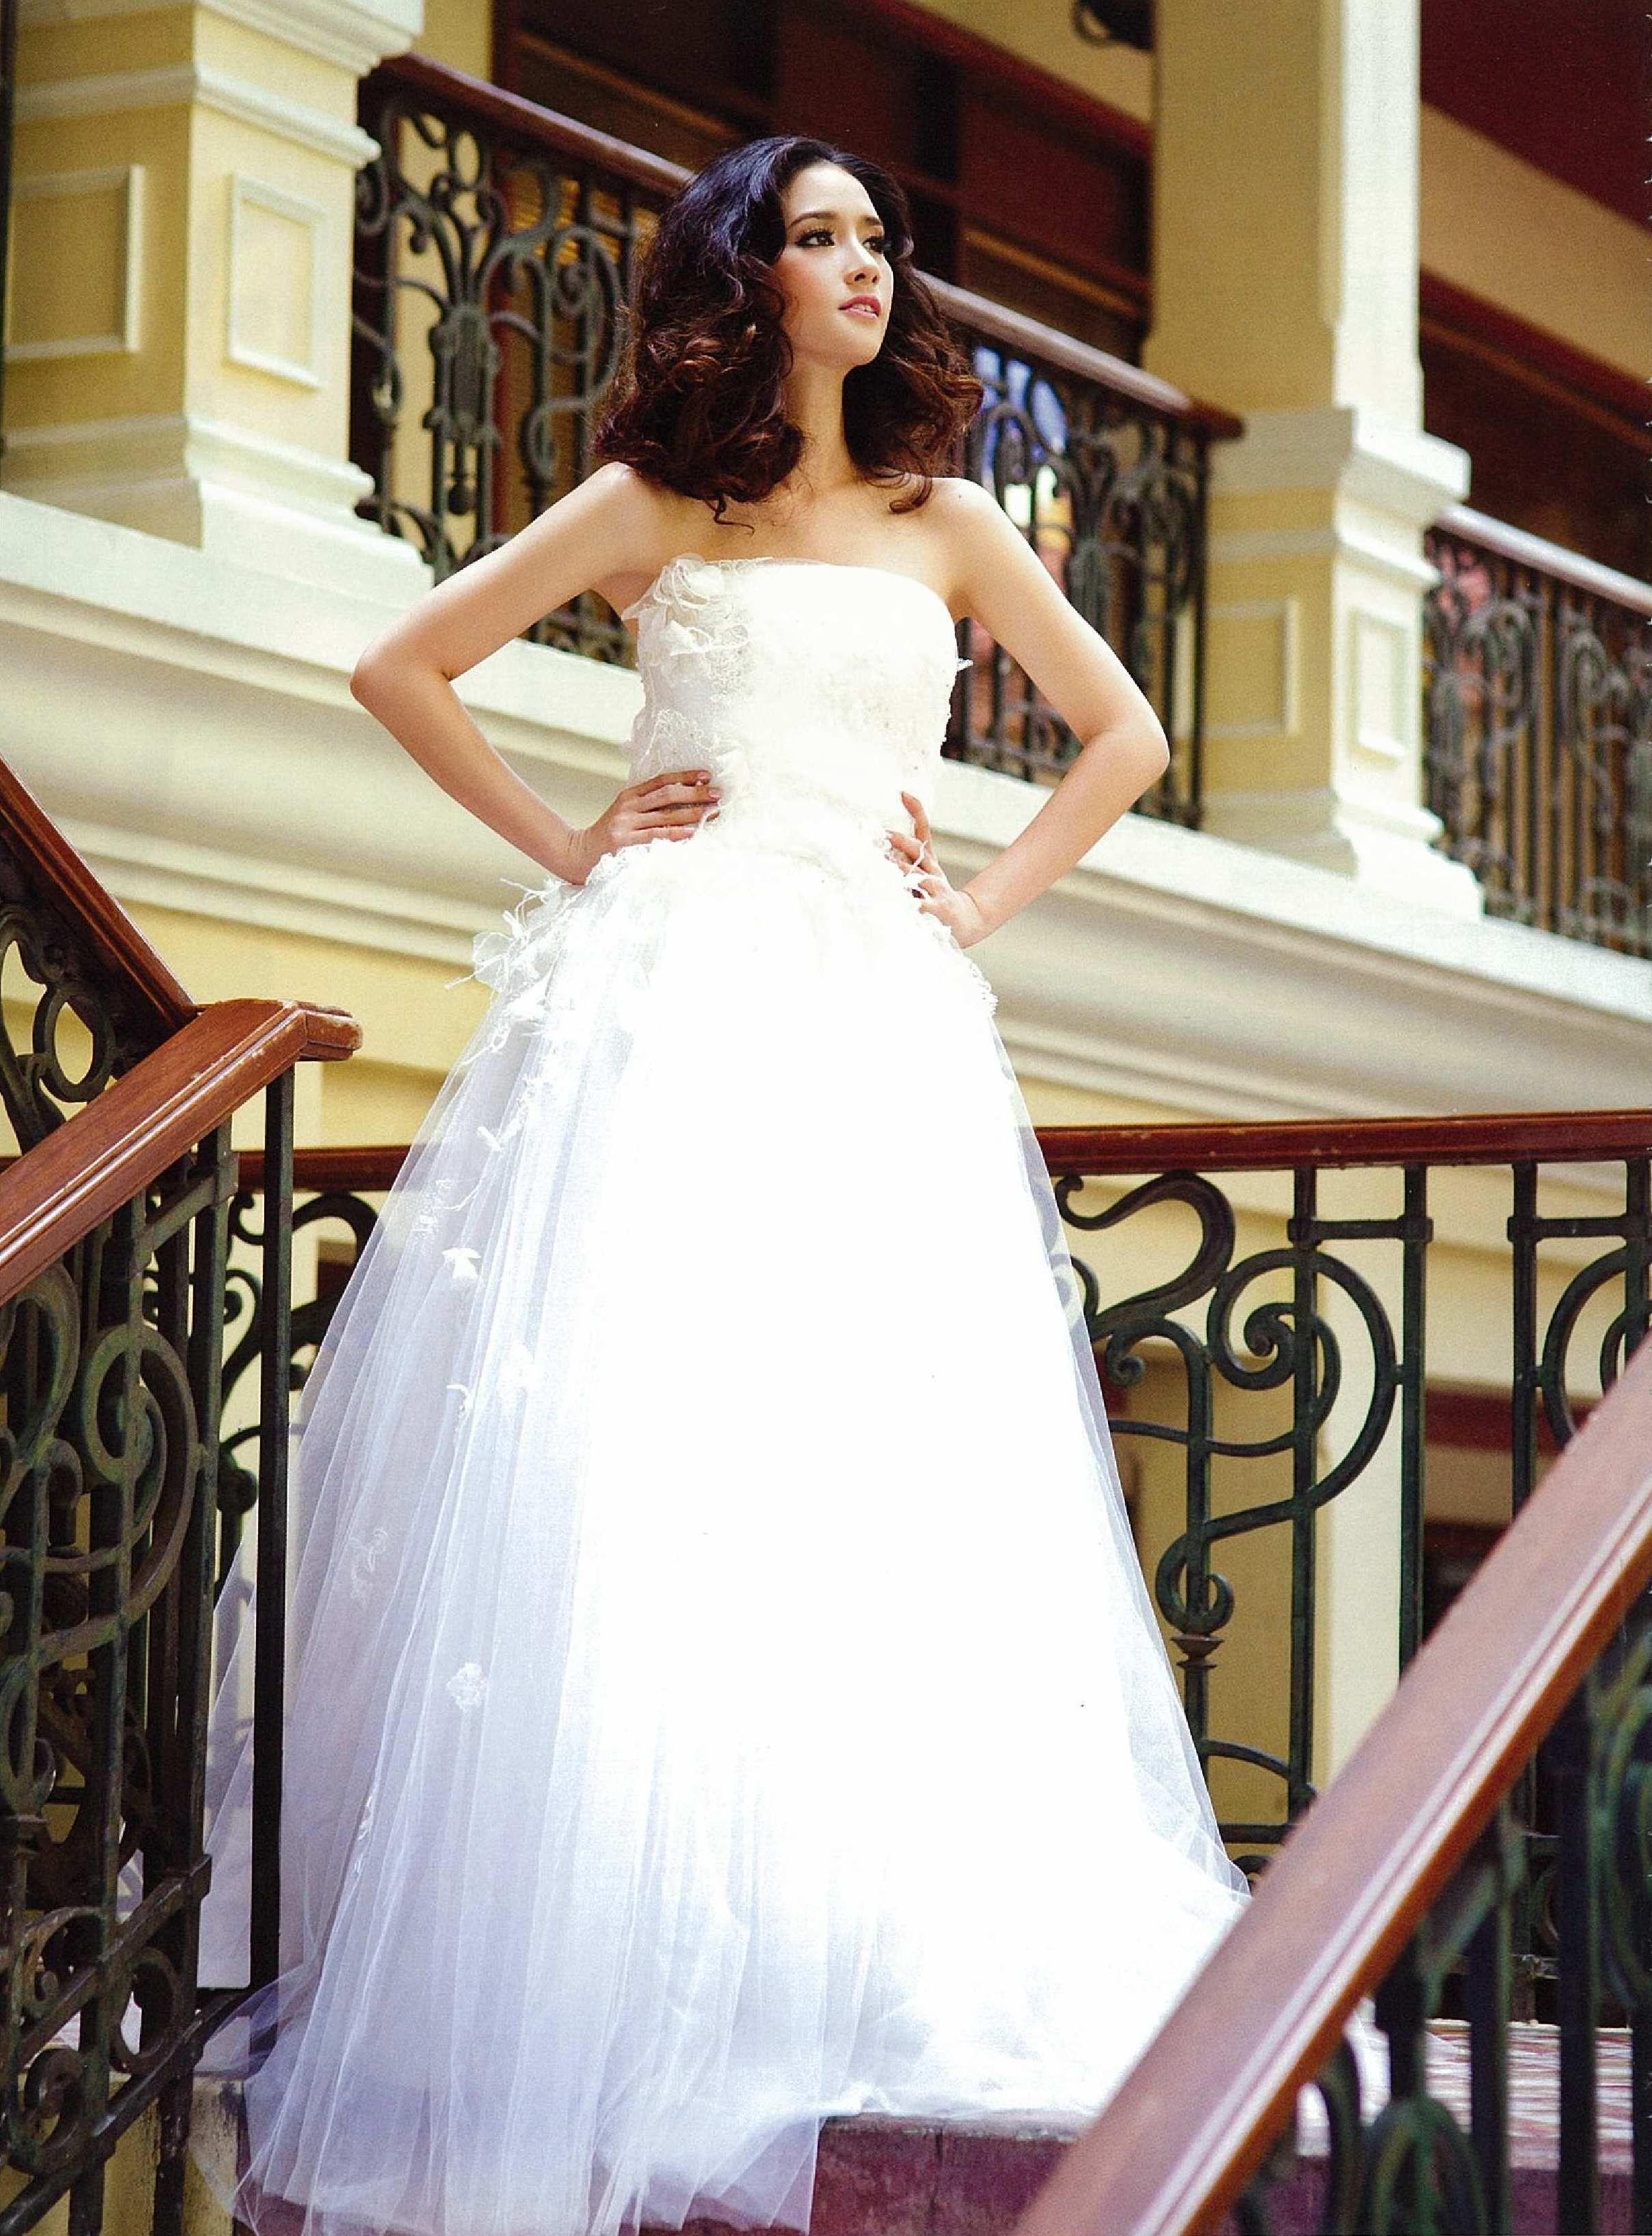 Bring Bride Back To 1896 Fashion Shoot Oct 2017 For Wedding Creation Magazine The Sukosol With Khun Mo Amena Pinit Thai Model Actress